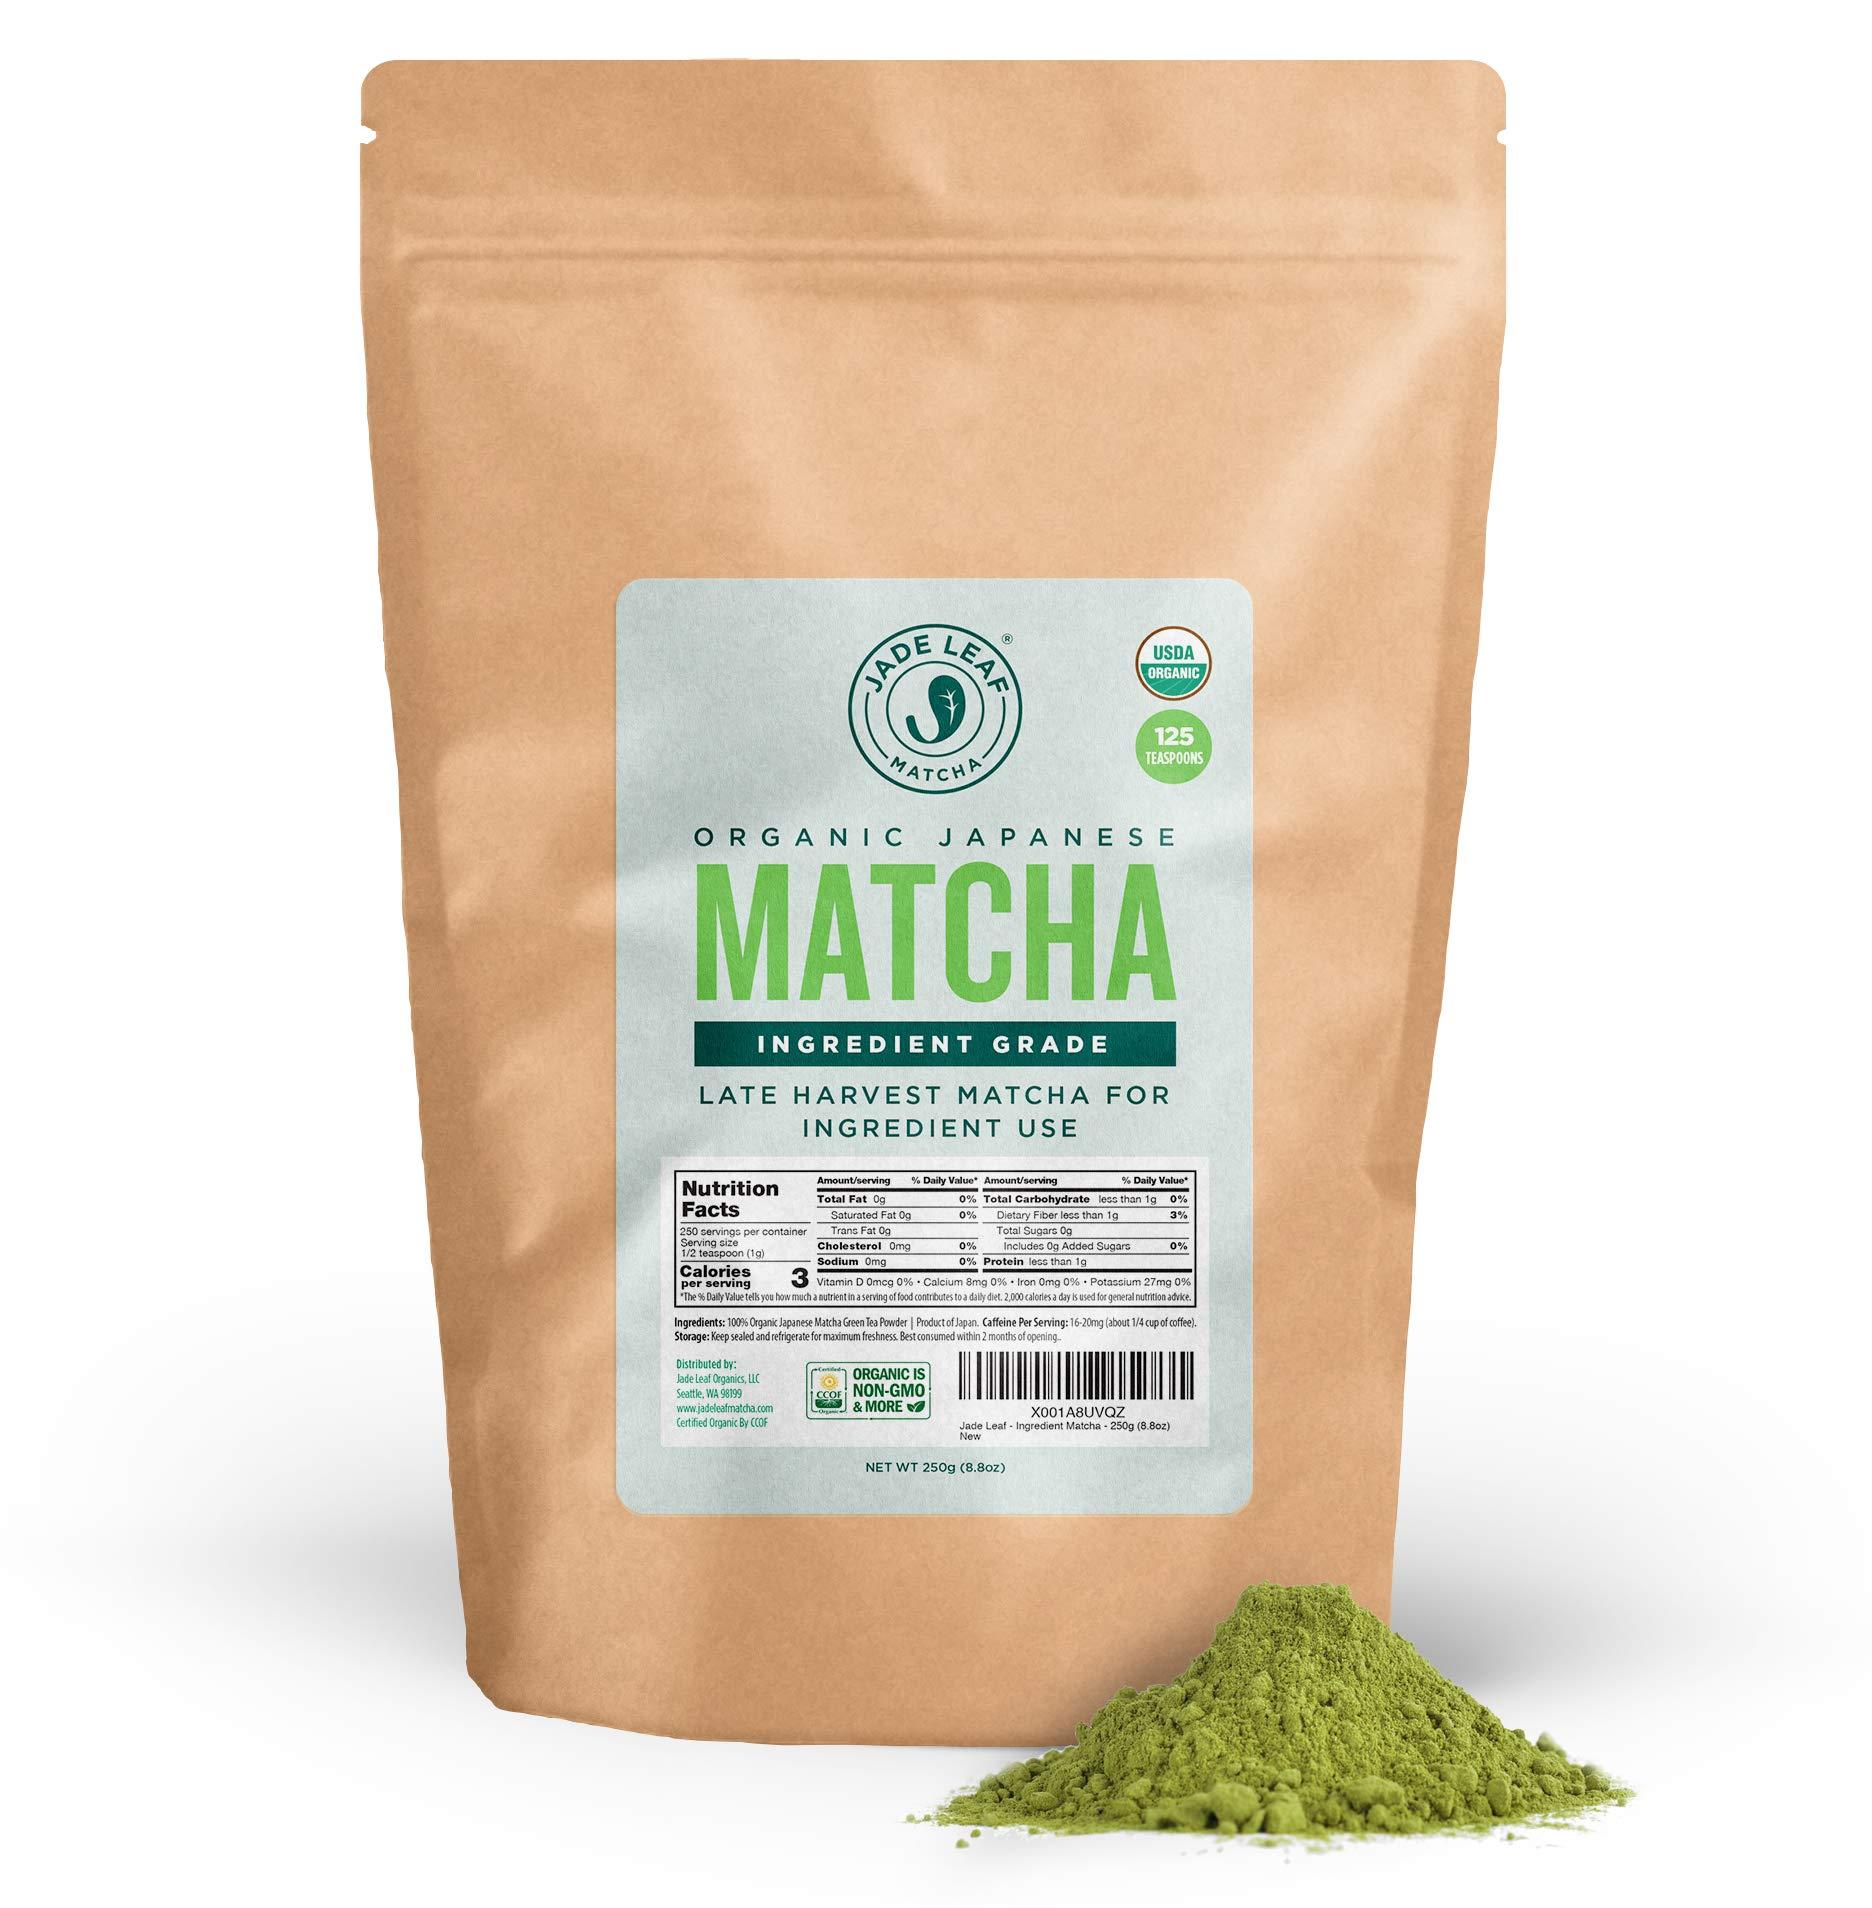 Jade Leaf - Organic Japanese Matcha Green Tea Powder, Ingredient Grade [8.8 Ounce]